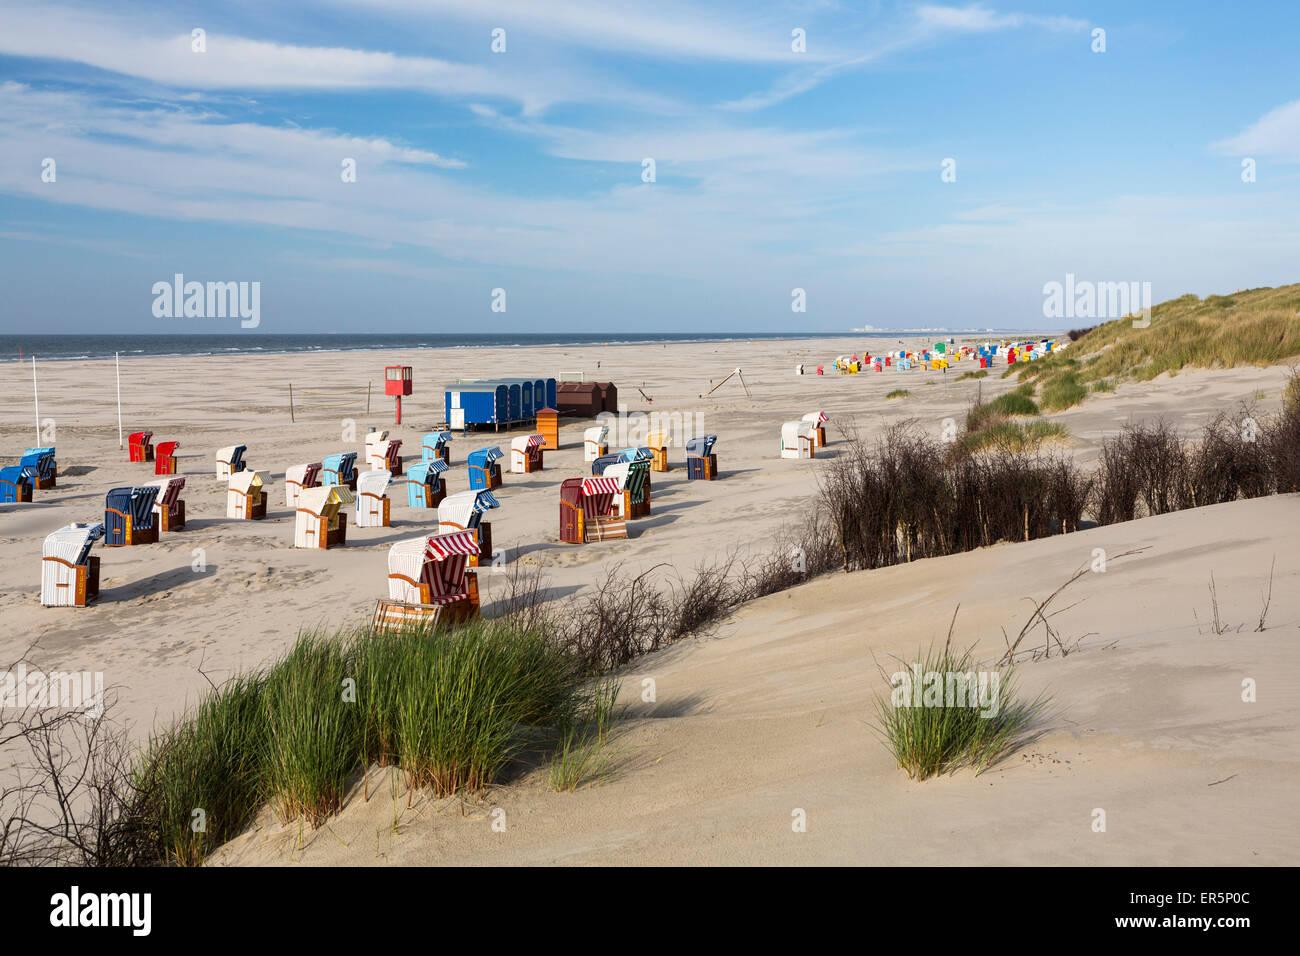 Beach chairs on the beach, Juist Island, North Sea, East Frisian Islands, East Frisia, Lower Saxony, Germany, Europe Stock Photo